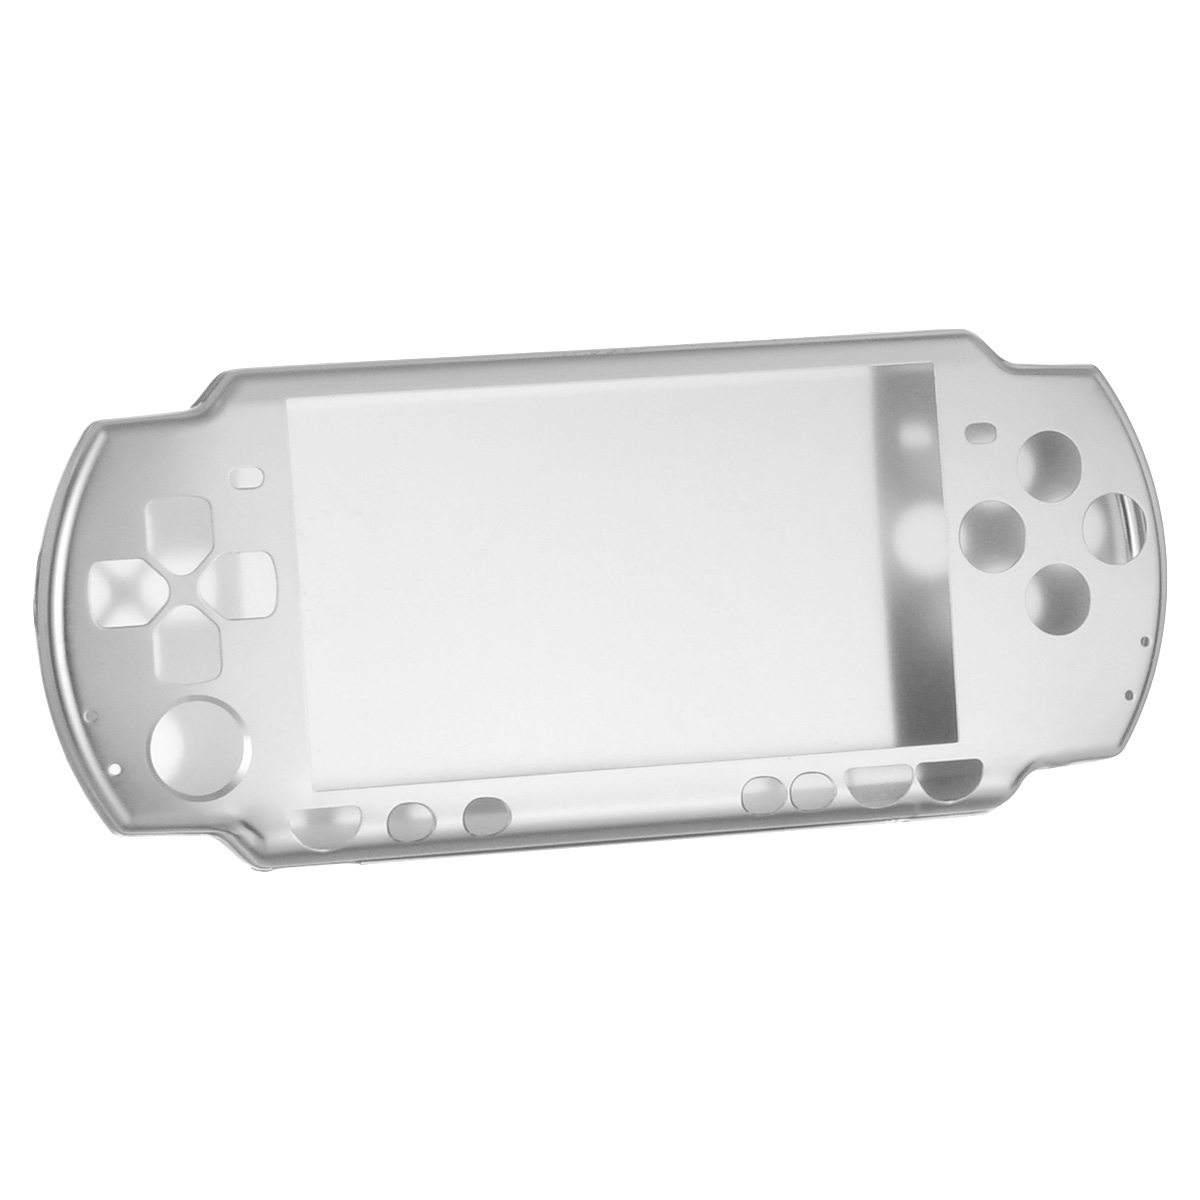 Алюминиевый защитный корпус Game Guru для Sony PSP 2000/3000 (серебряный) 3 6v 2400mah rechargeable battery pack for psp 3000 2000